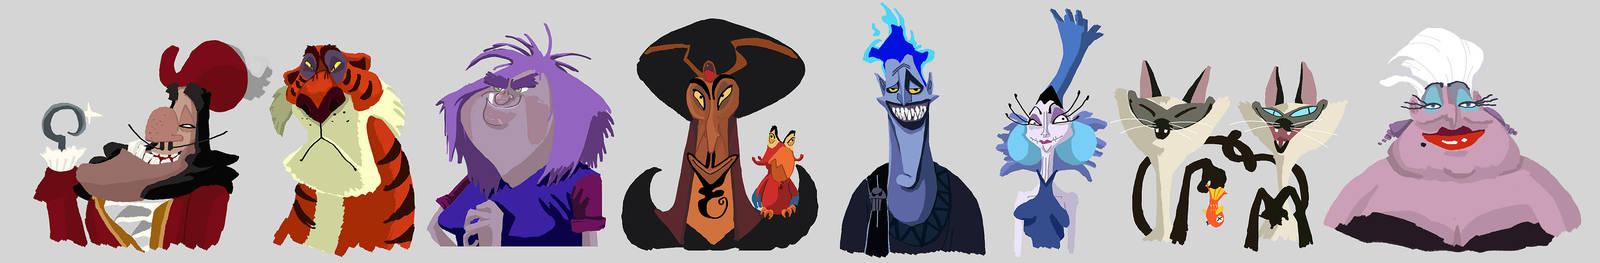 Disney villains by Annamalie